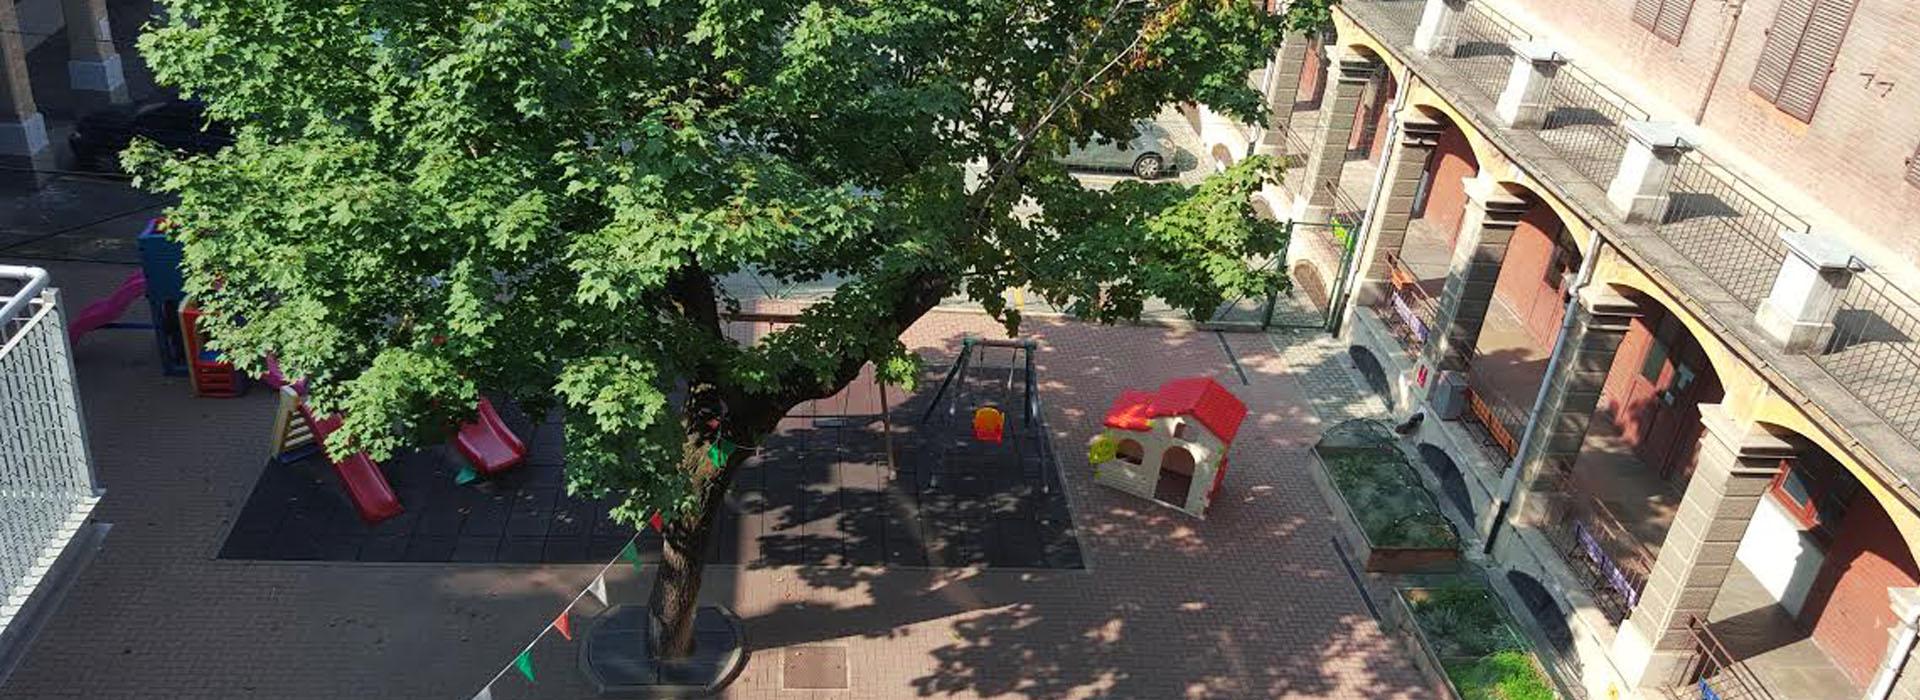 scuola-sacrafamiglia-torino1